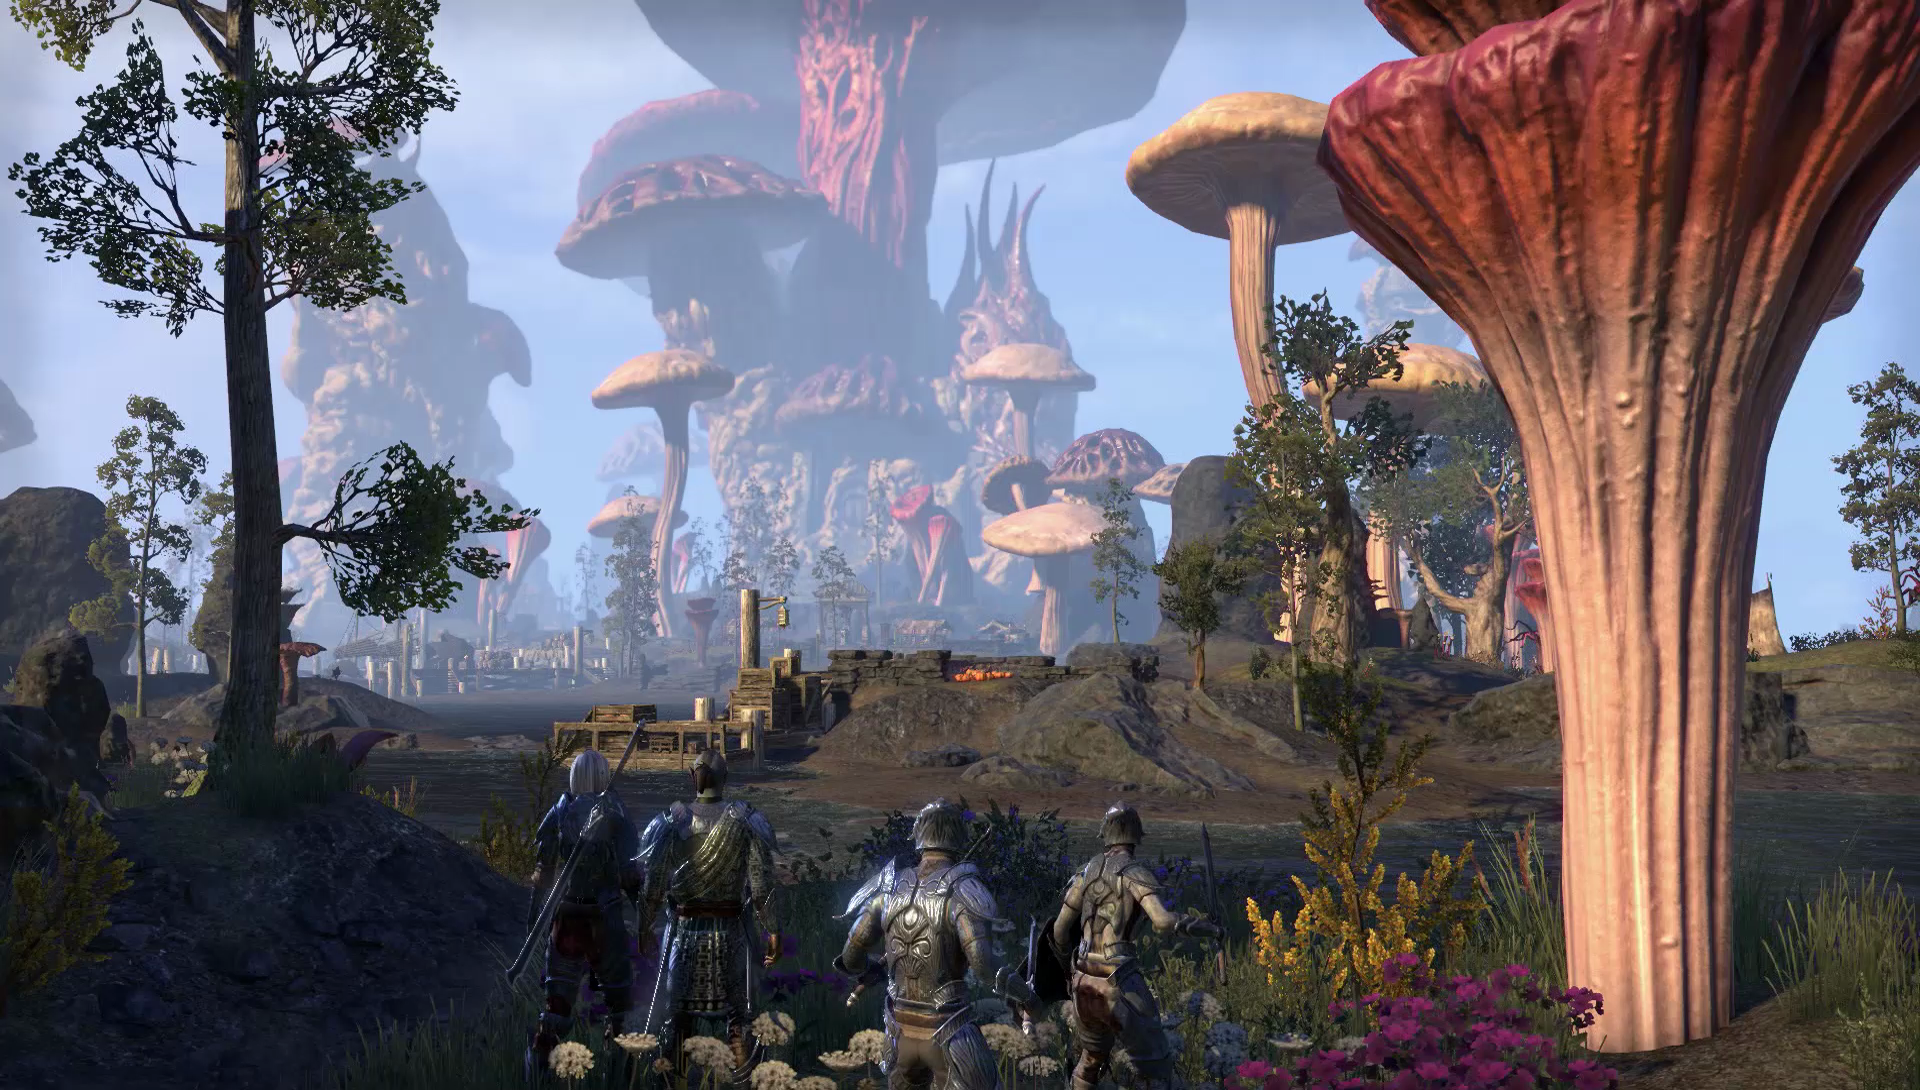 Elder Scrolls Online: Morrowind Gets its First Gameplay Trailer, New